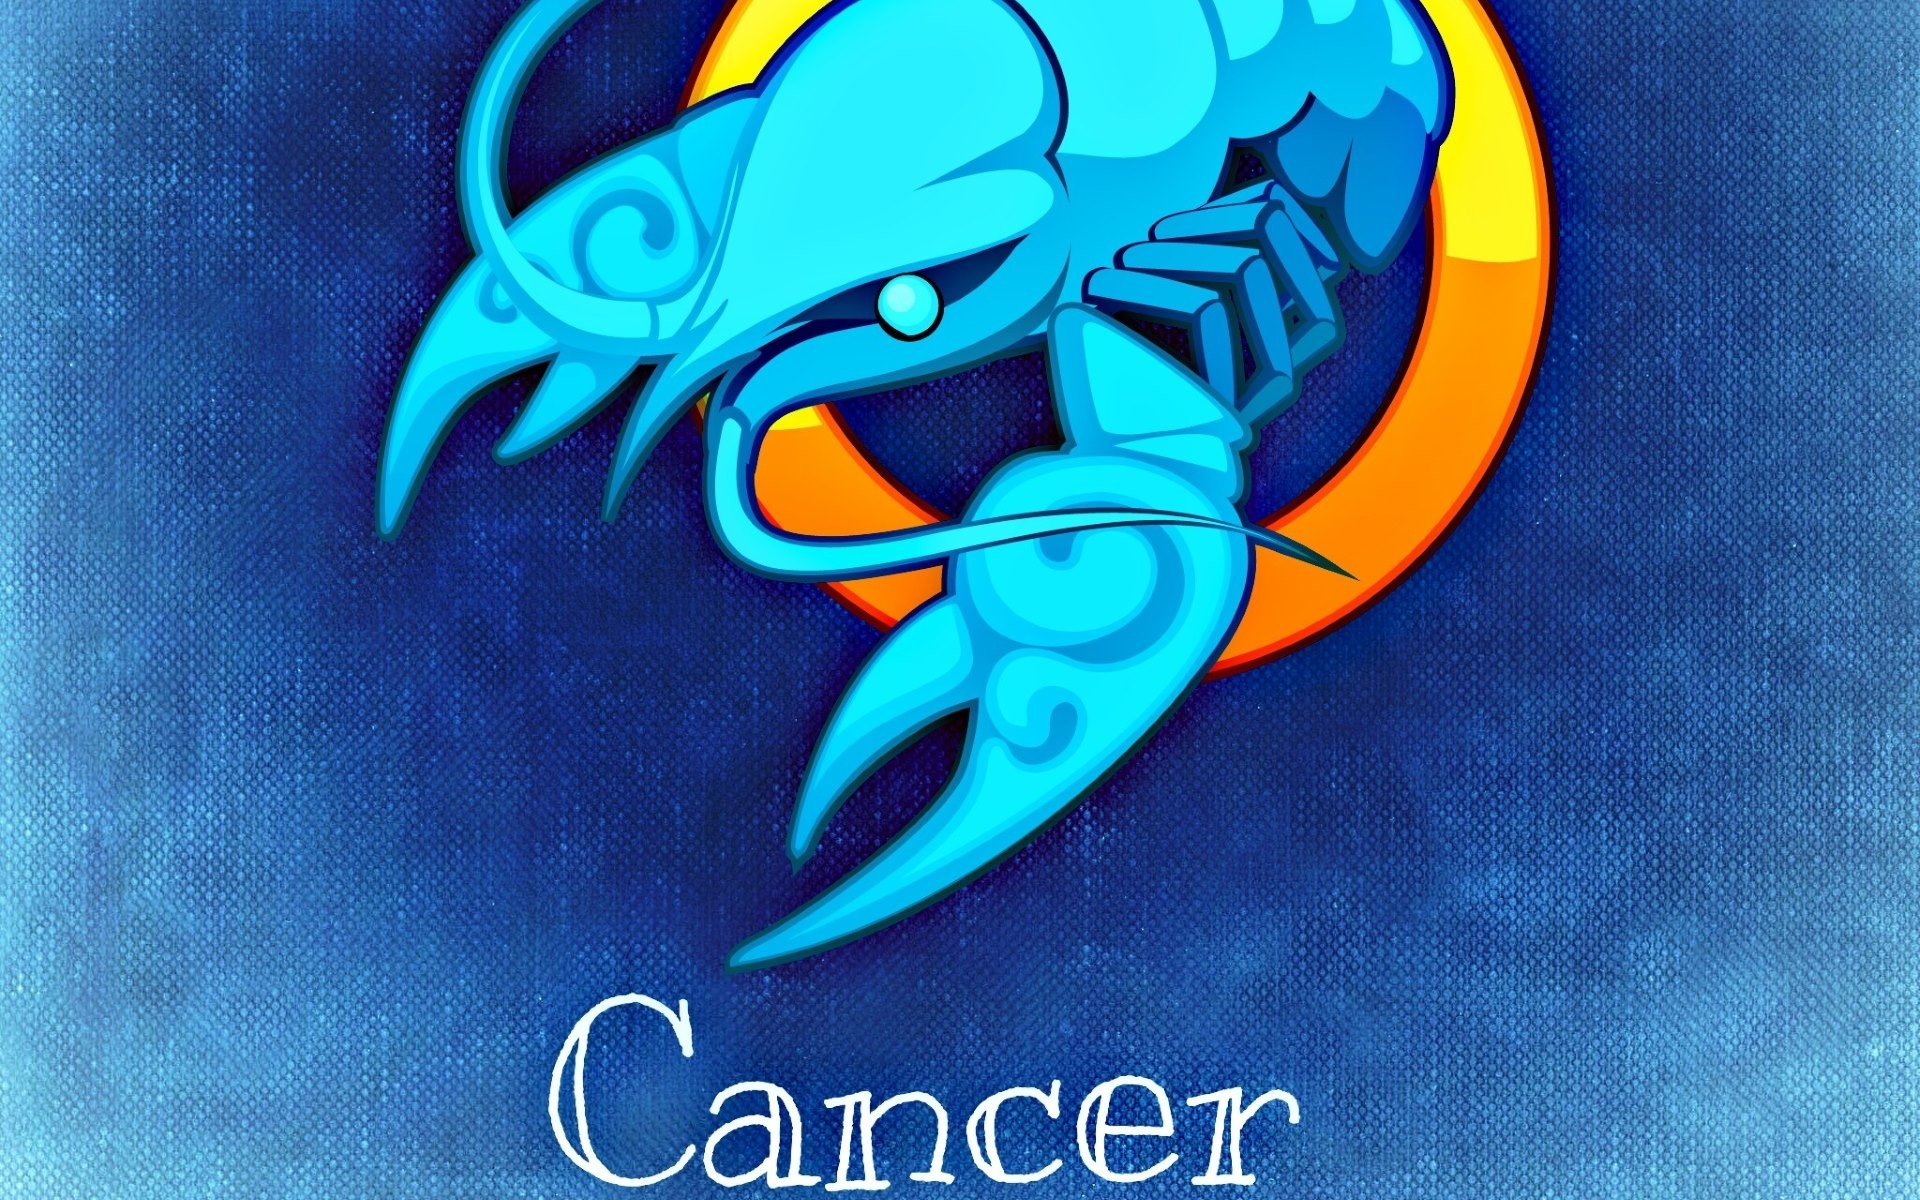 166 1662796 wallpaper horoscope cancer widescreen desktop zodiac sign cancer